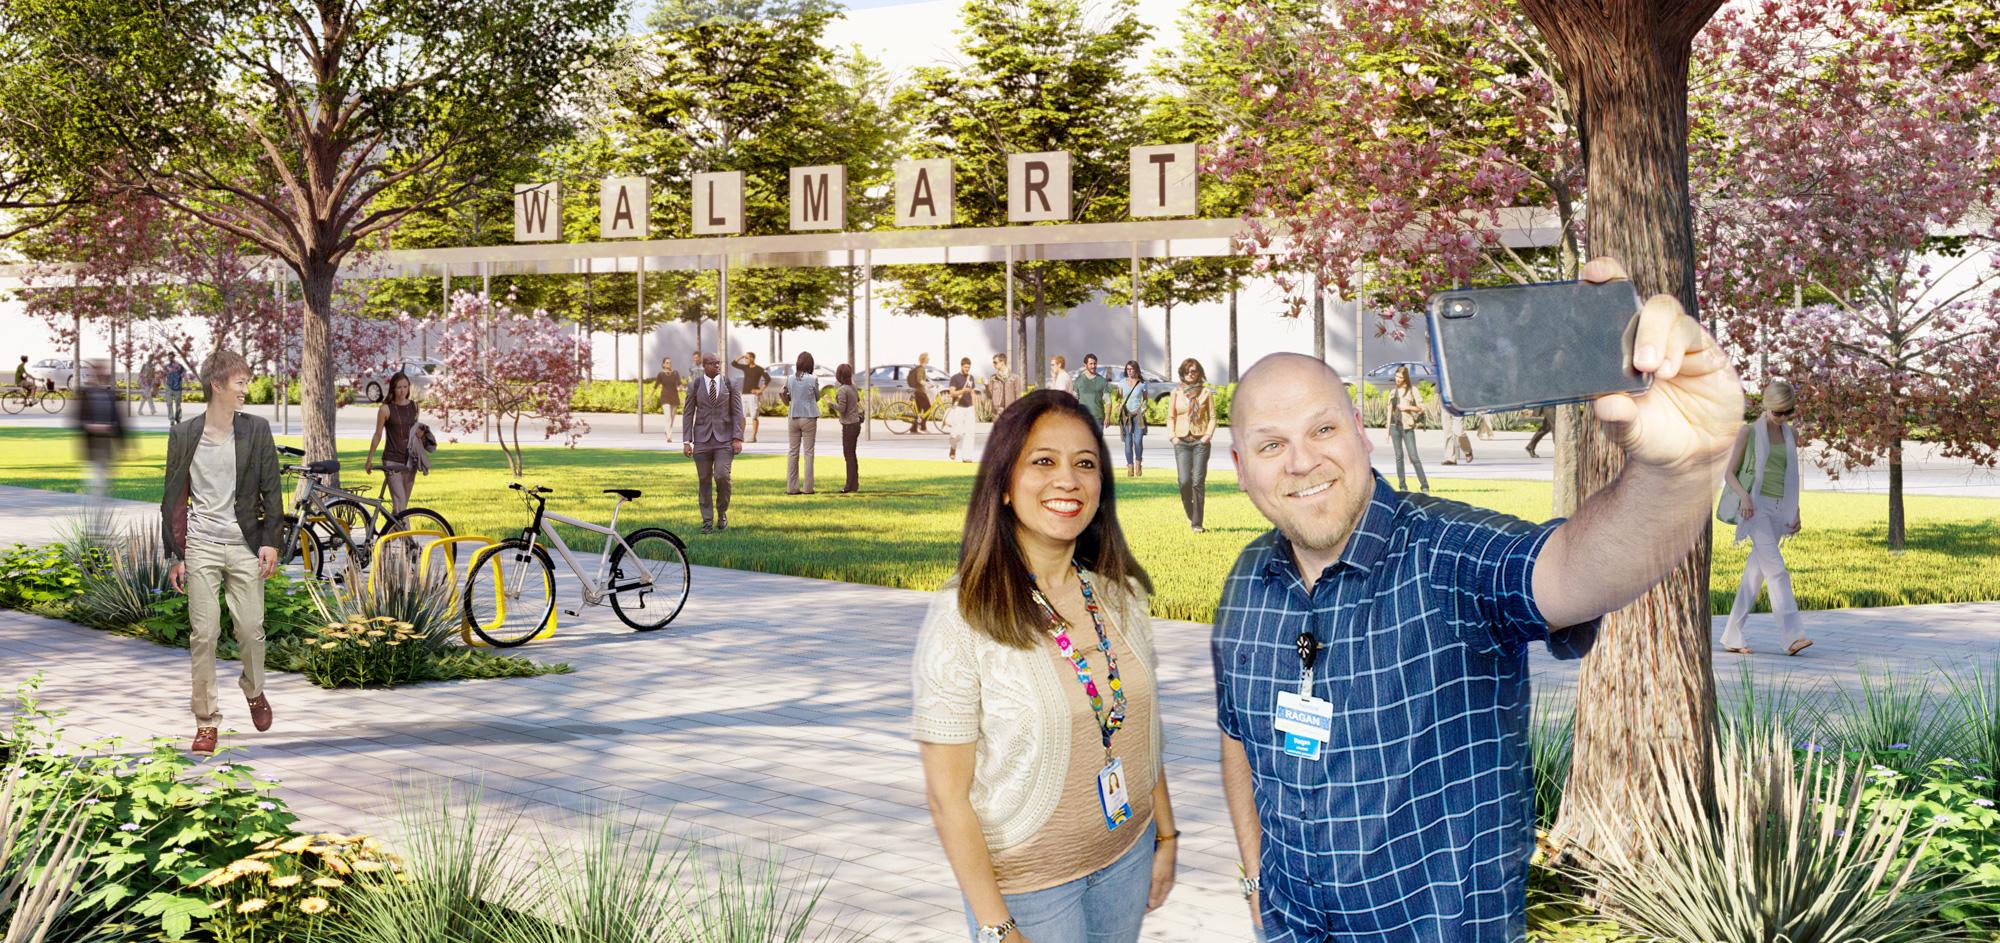 Walmart Has Big Plans for Its New HQ